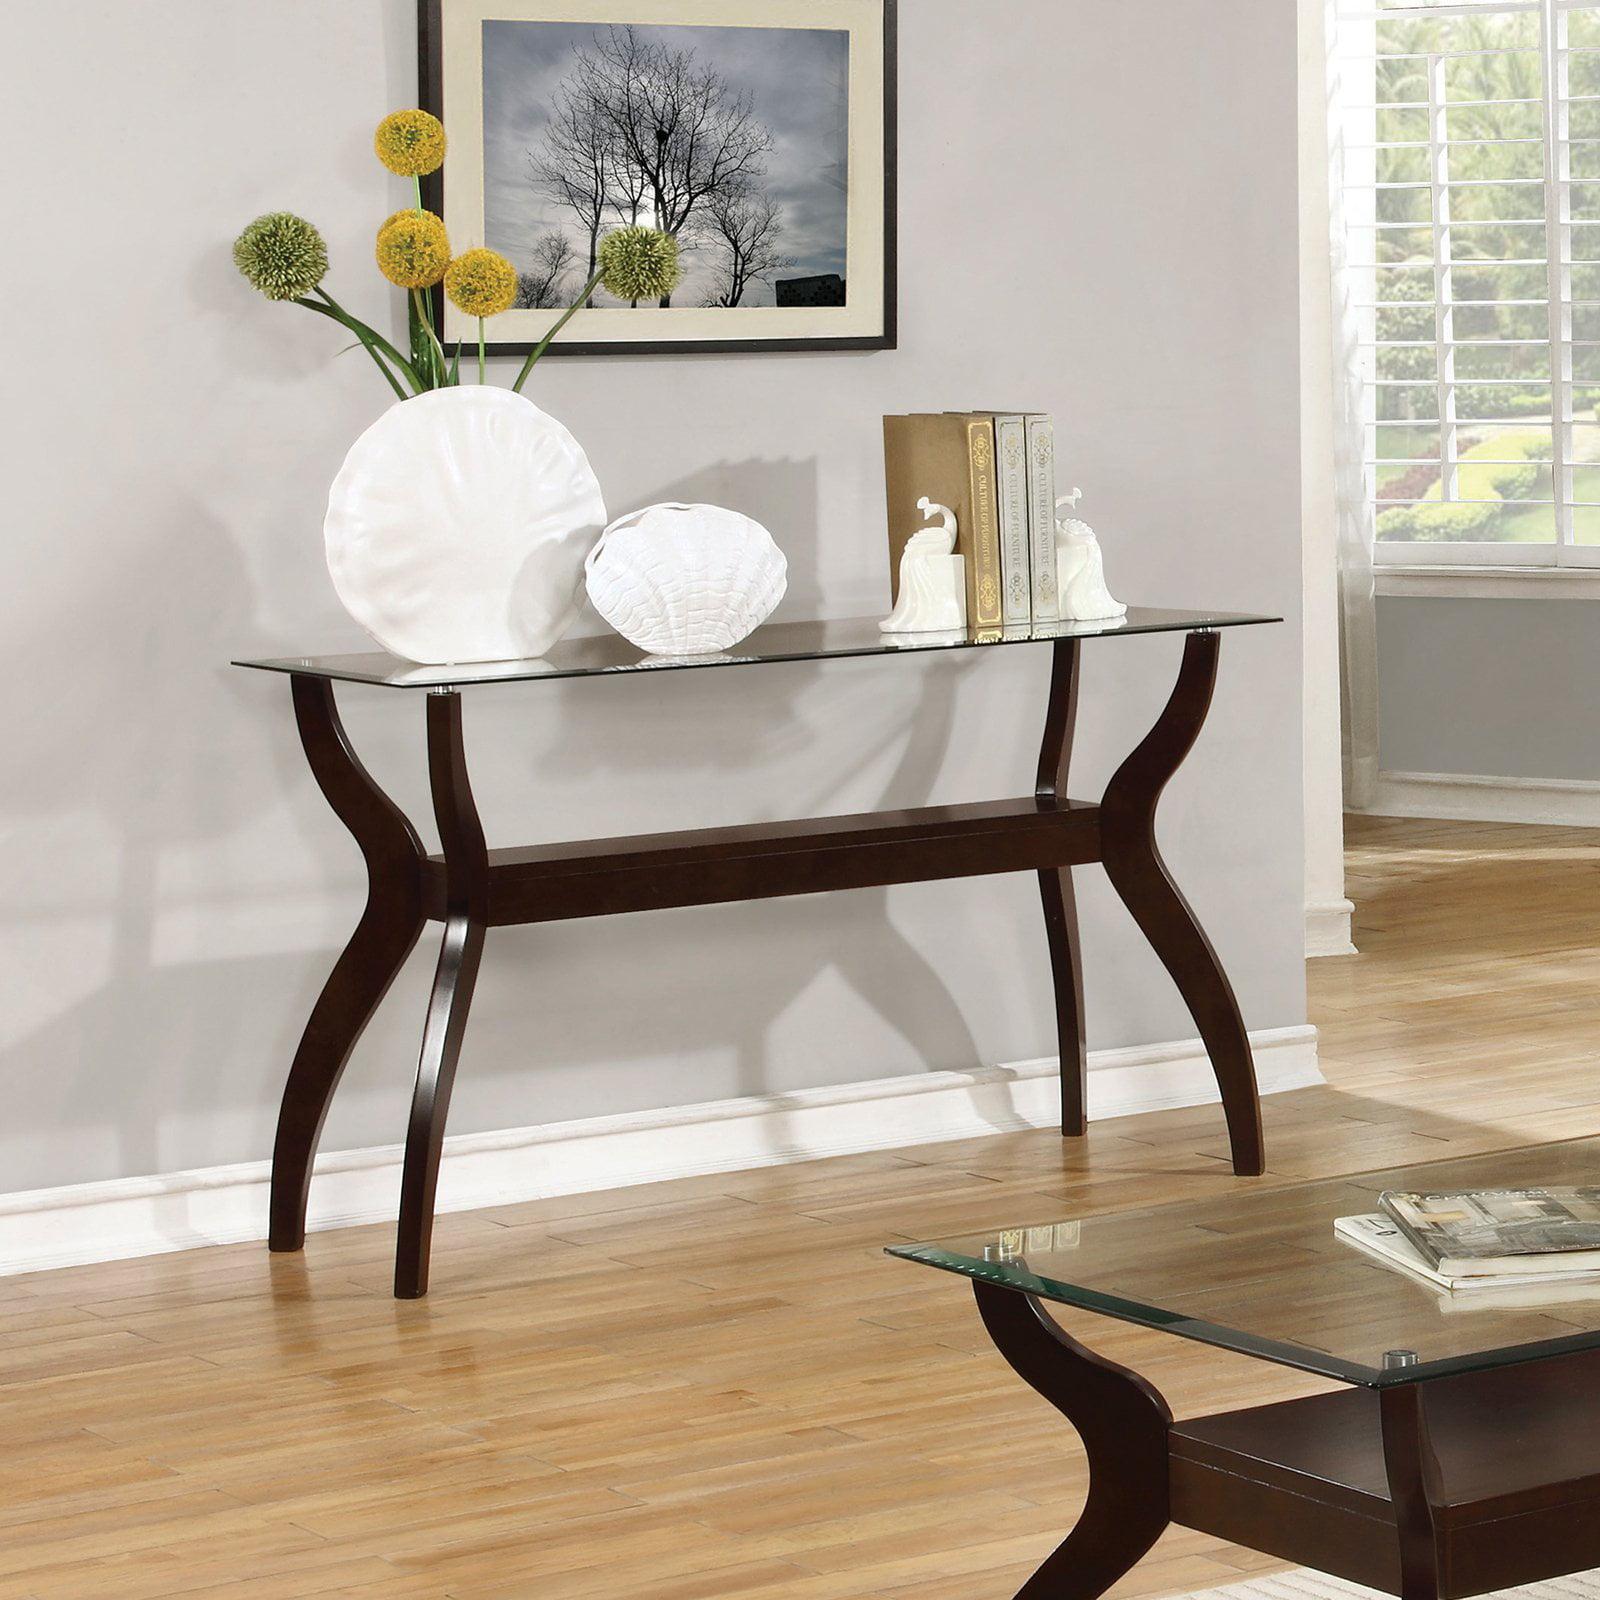 Coaster Furniture Glass Top Sofa Table Cappuccino by Coaster Furniture